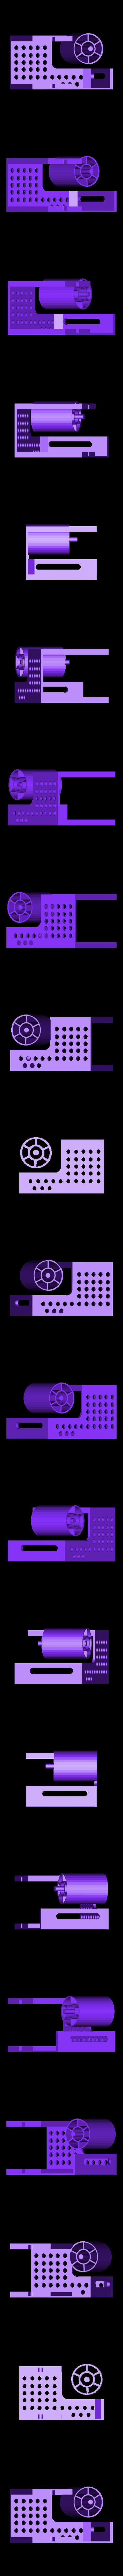 blueprinted_spool_W_ROLLERS_FULL.stl Download free STL file SPOOL HOLDER (BLUEPRINT3D EDITION) • 3D printer object, hugo